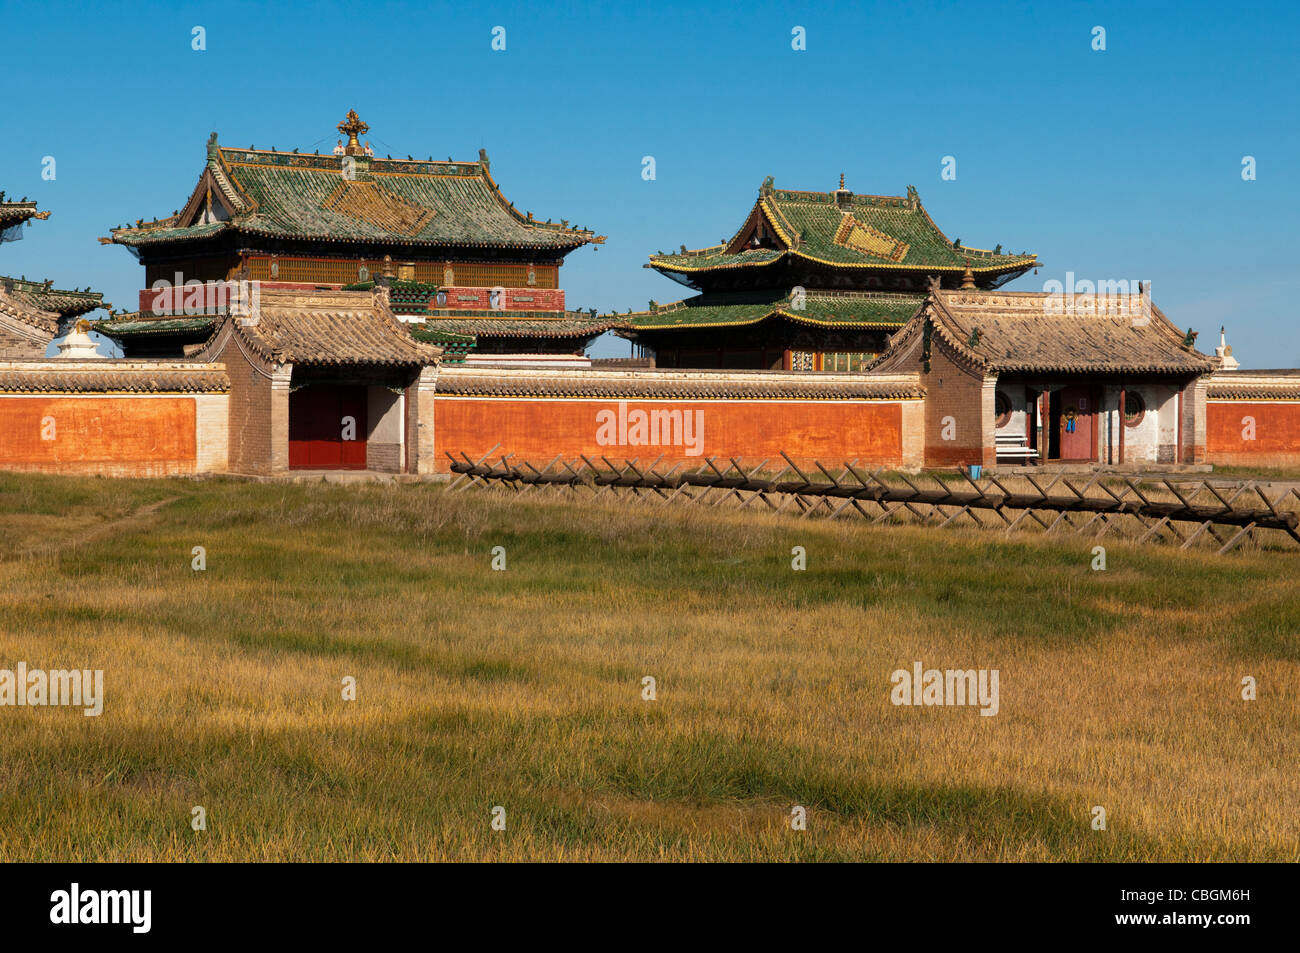 Erdene Zuu (Karakorum) Monastery in Central Mongolia - Stock Image